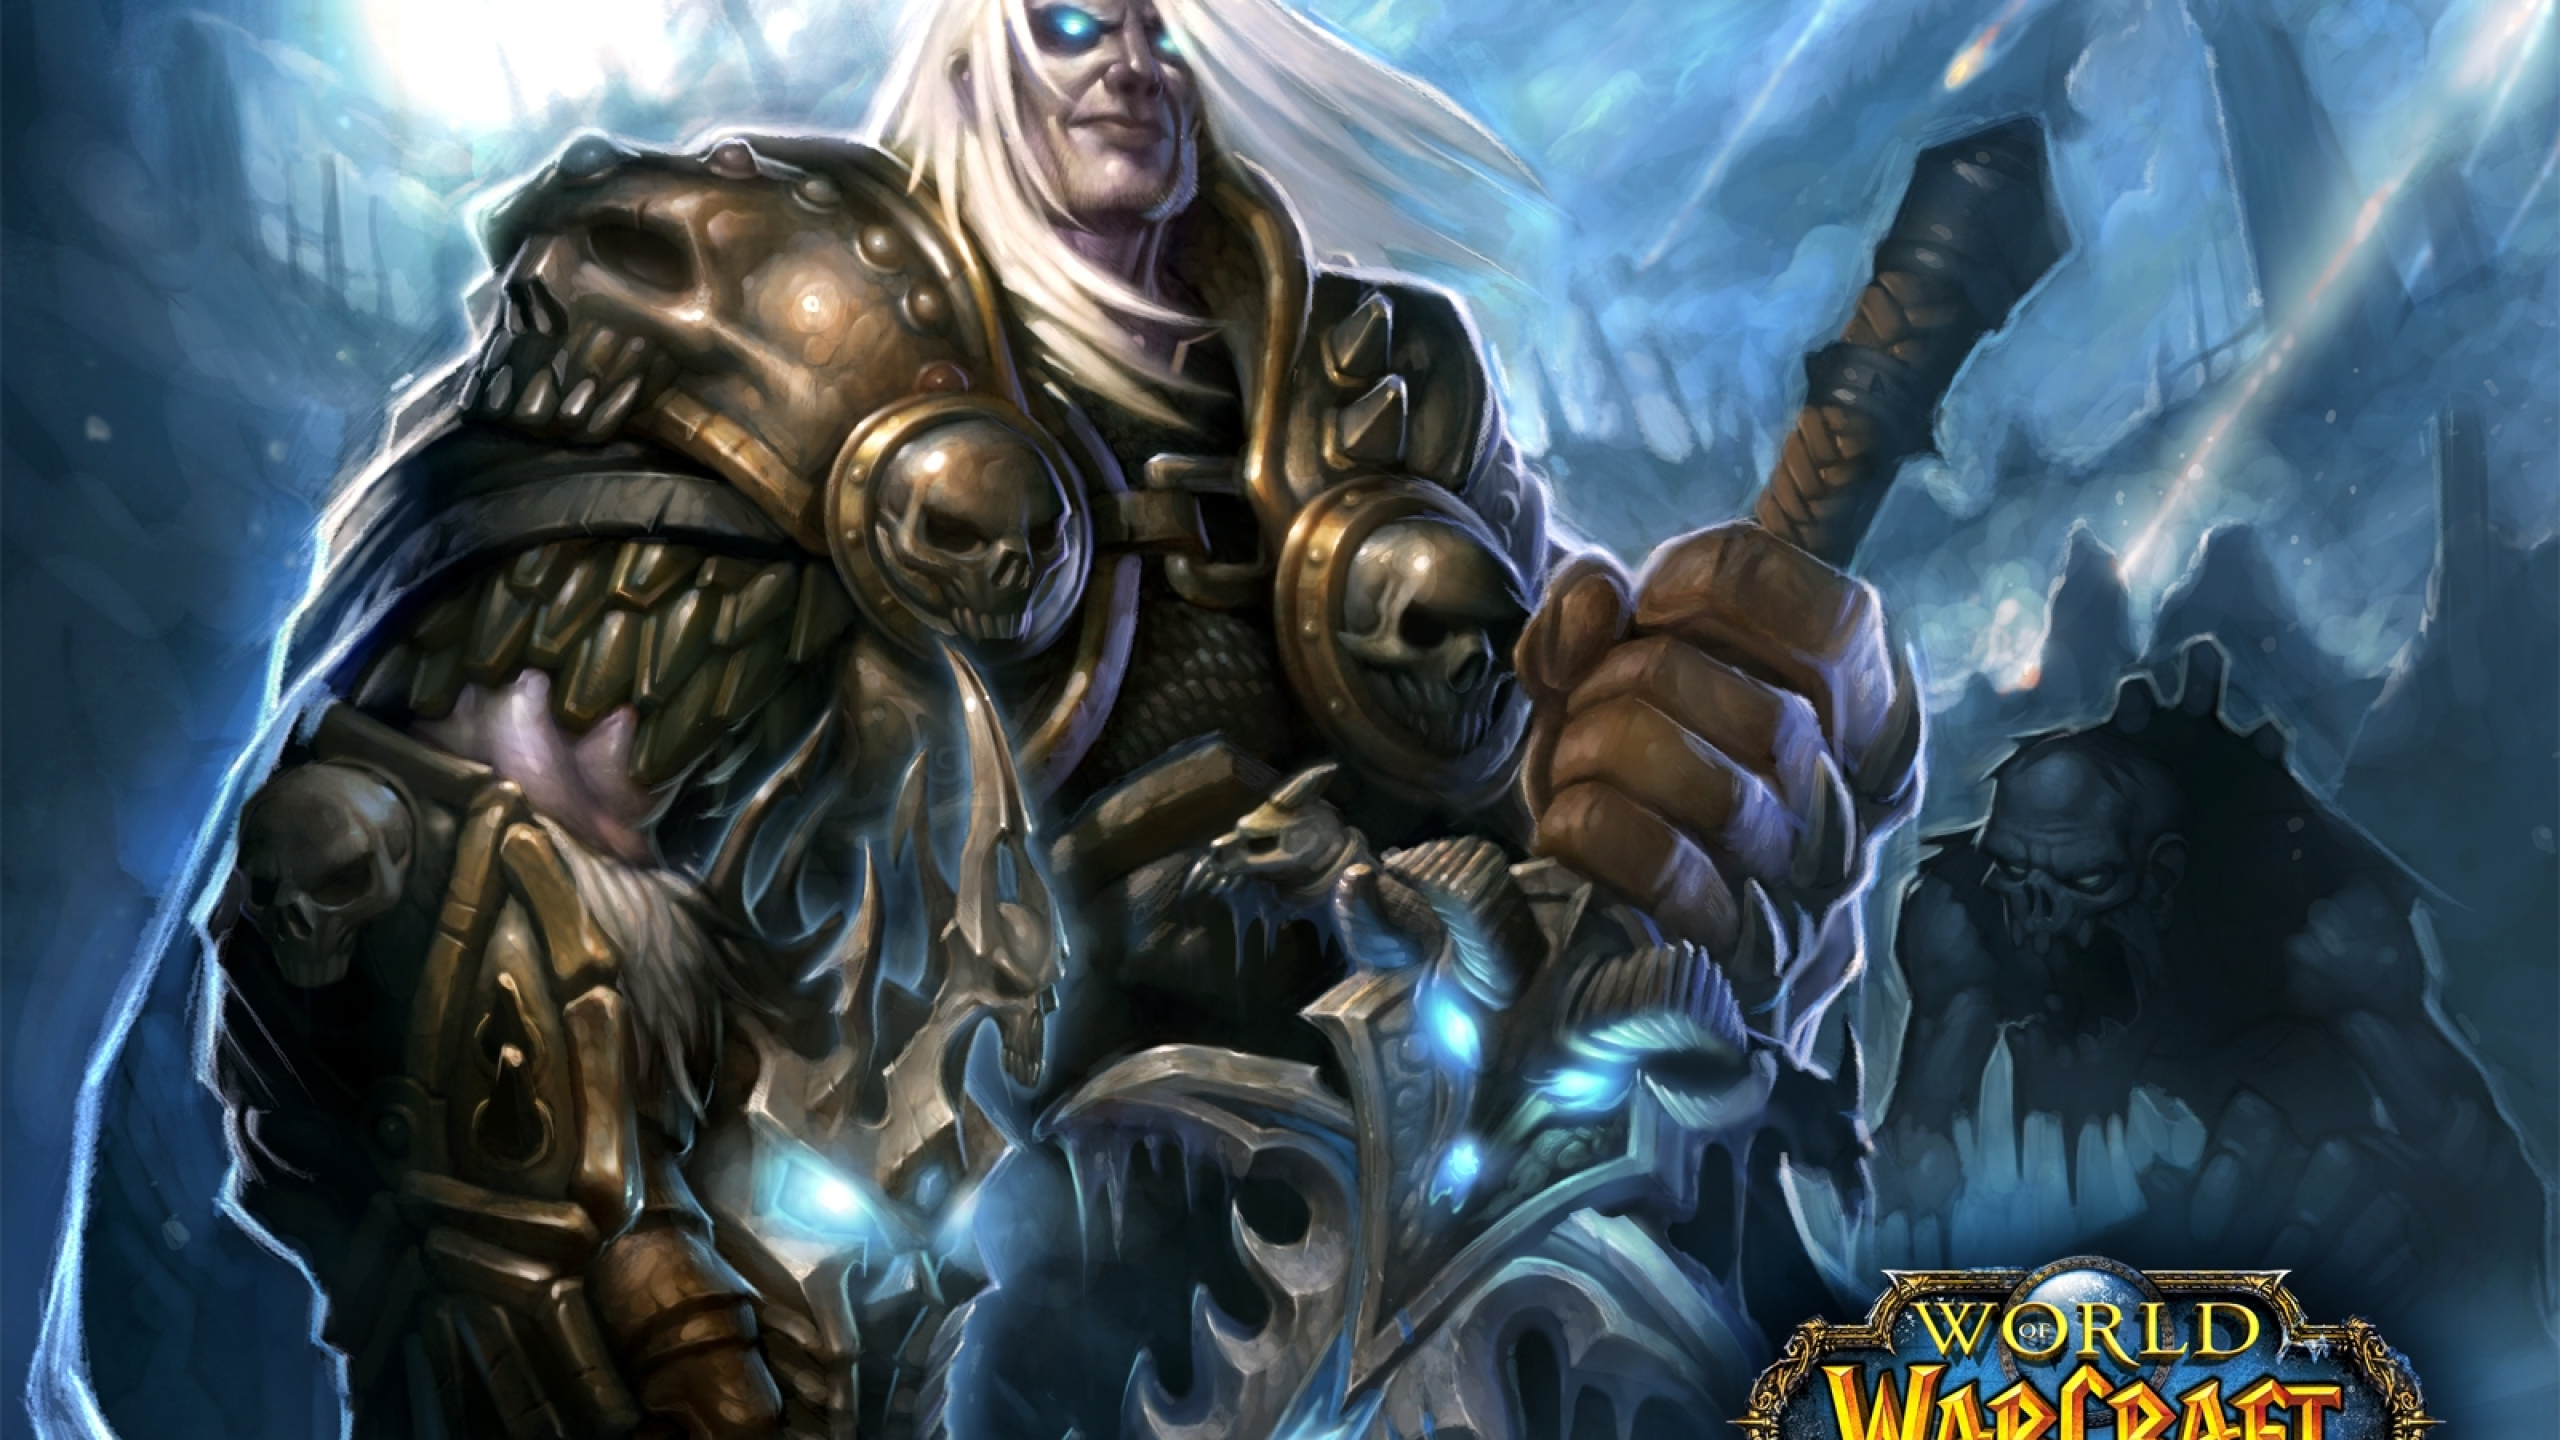 2560x1440 Warcraft Arthas Wow 1440p Resolution Wallpaper Hd